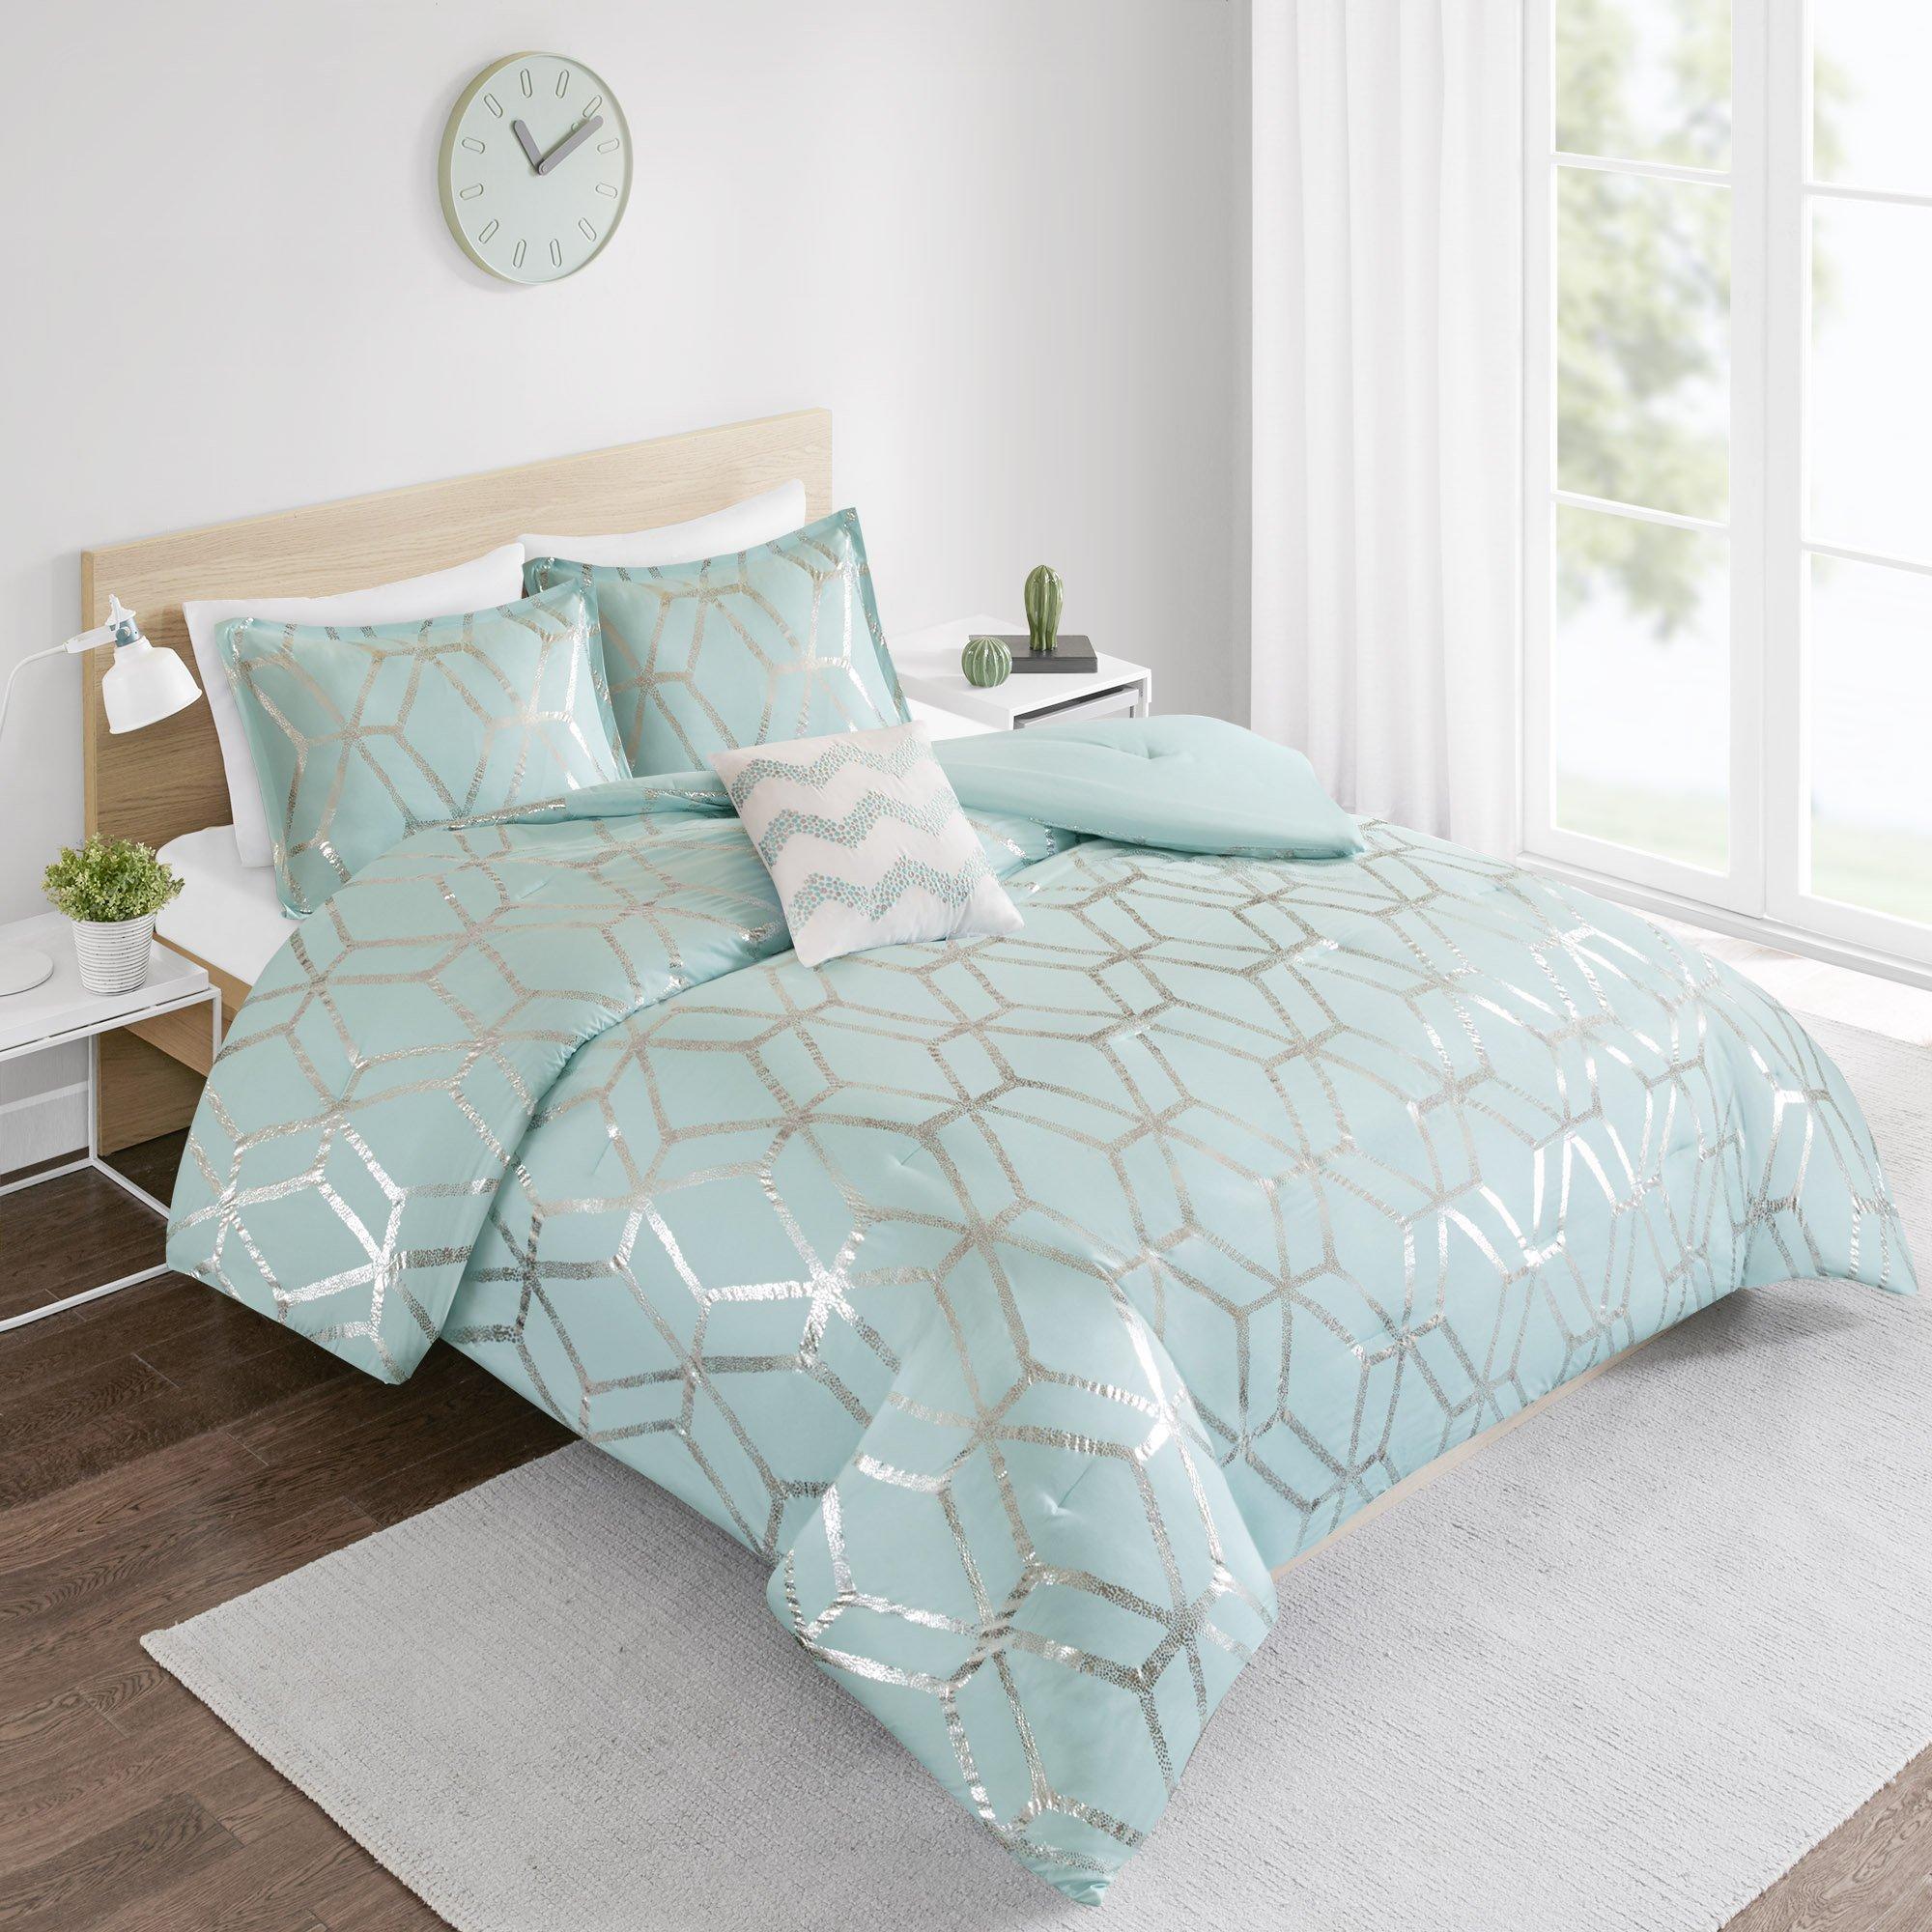 Details About Comforter Set Twin Bedding Set Vivian 3 Piece Aqua Bluesilver Geometric